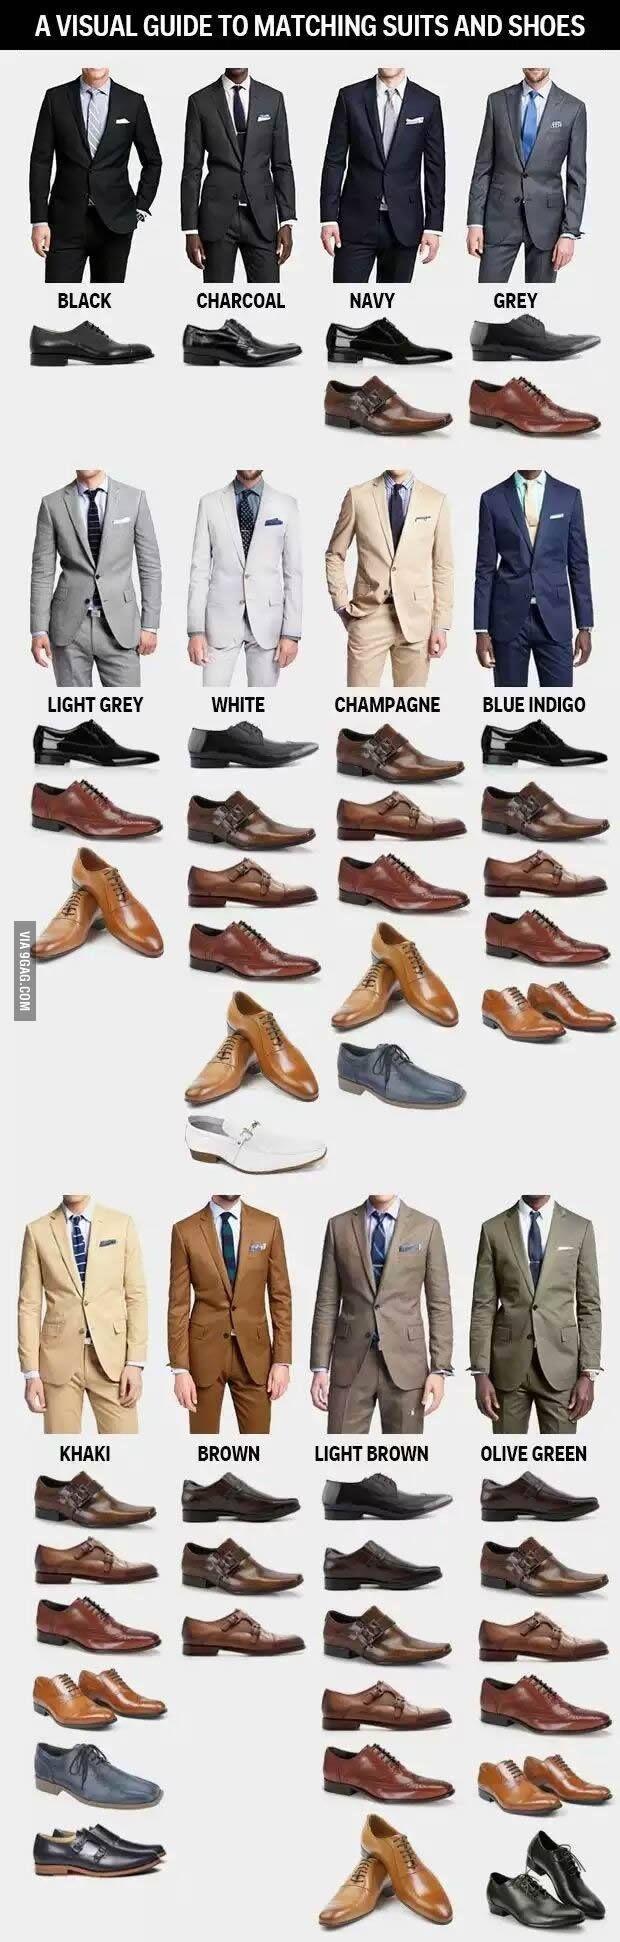 Combina http://www.99wtf.net/men/mens-fasion/latest-mens-fashion-trends-2016/